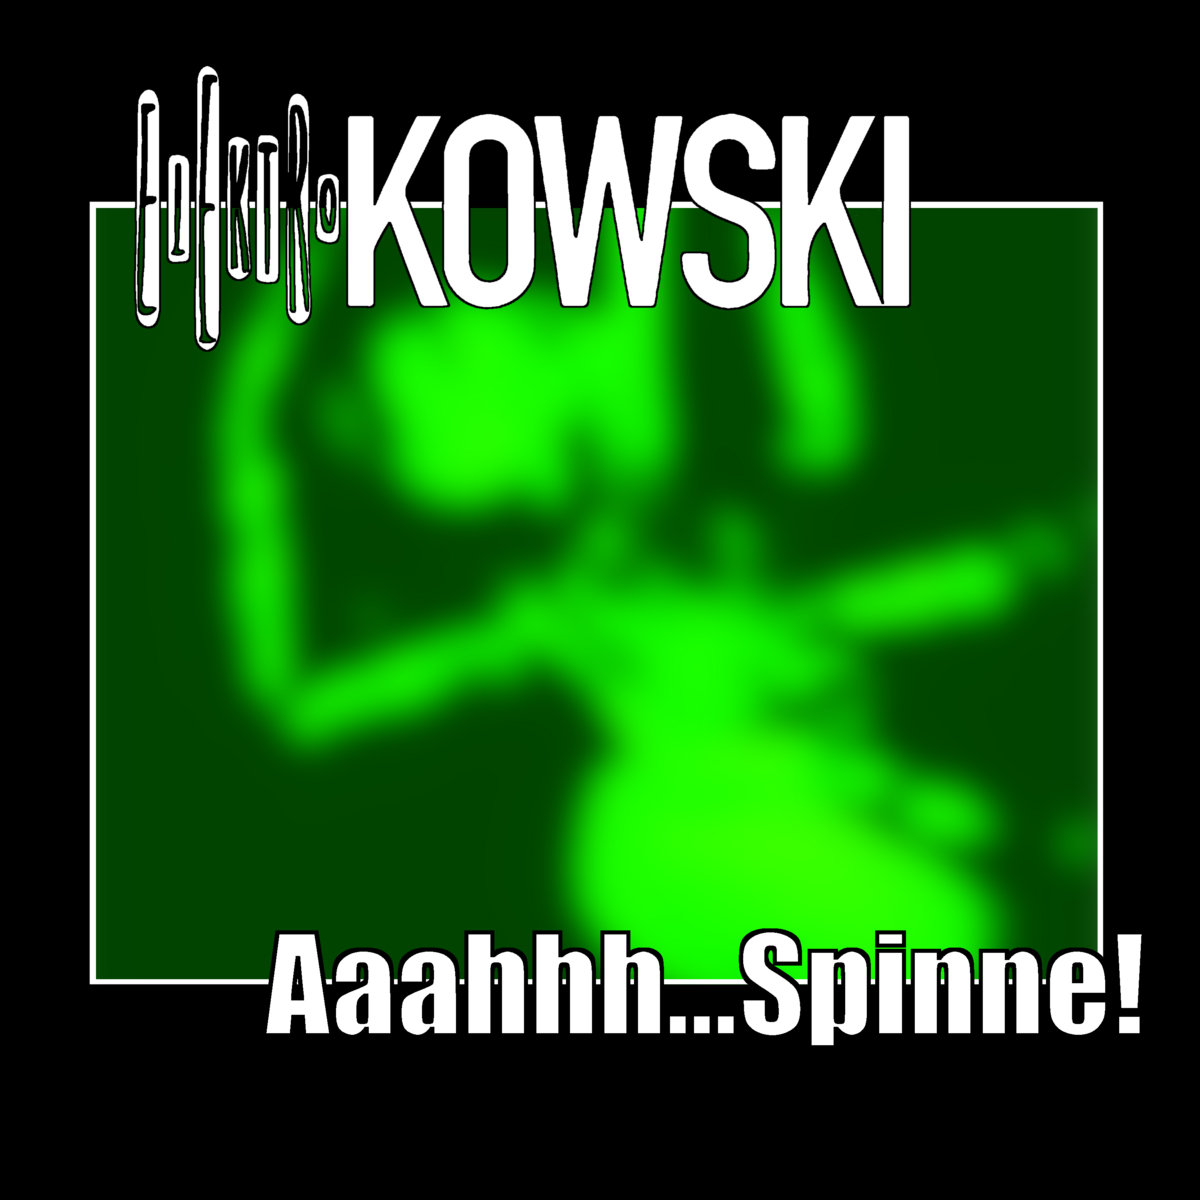 Aaahhh...Spinne! by Elektrokowski